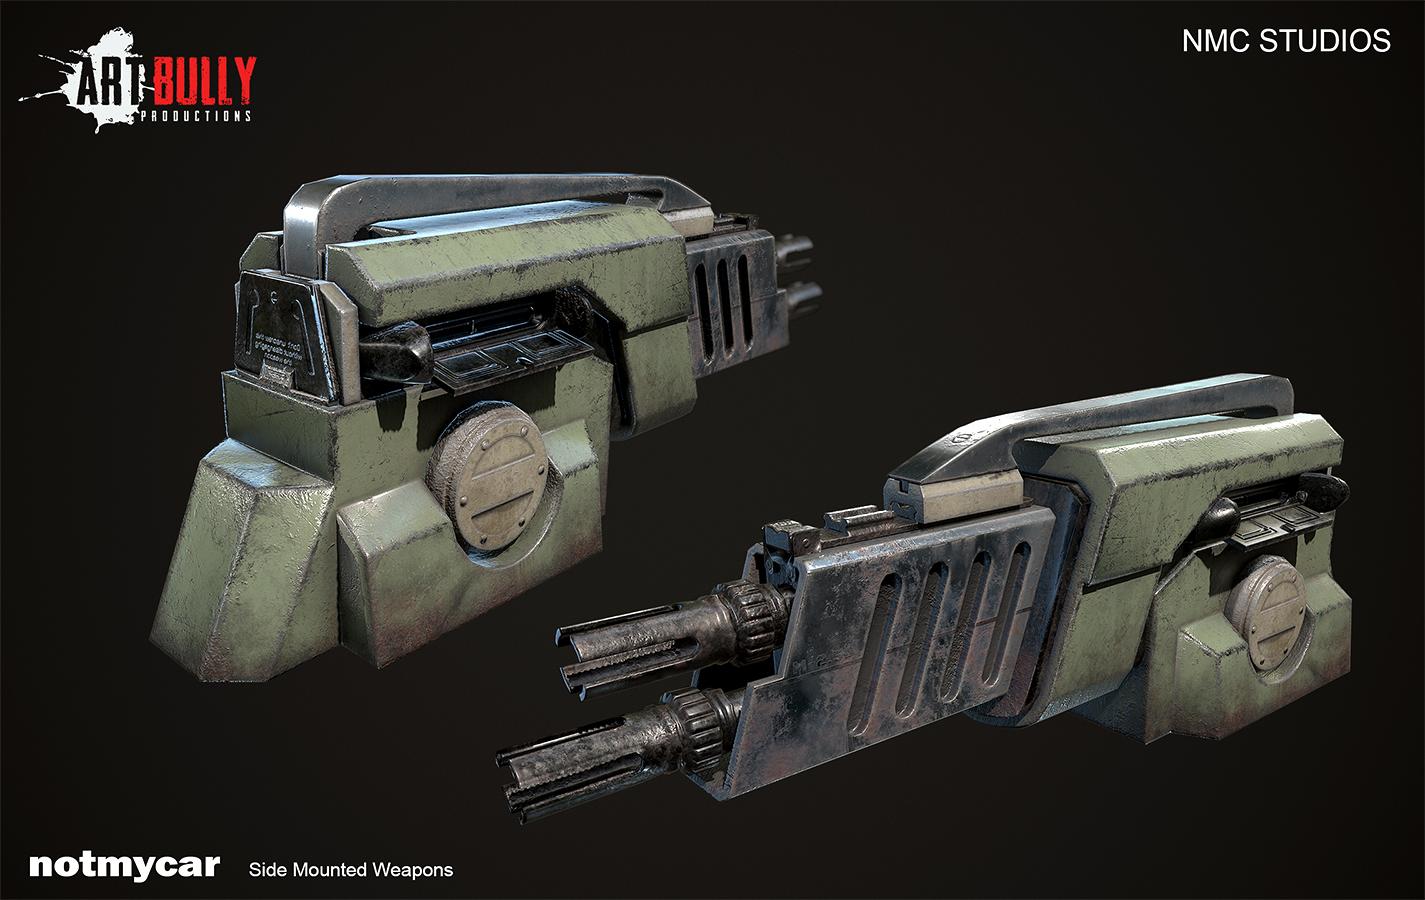 NMC_Side_Mounted_Weaponsab.jpg